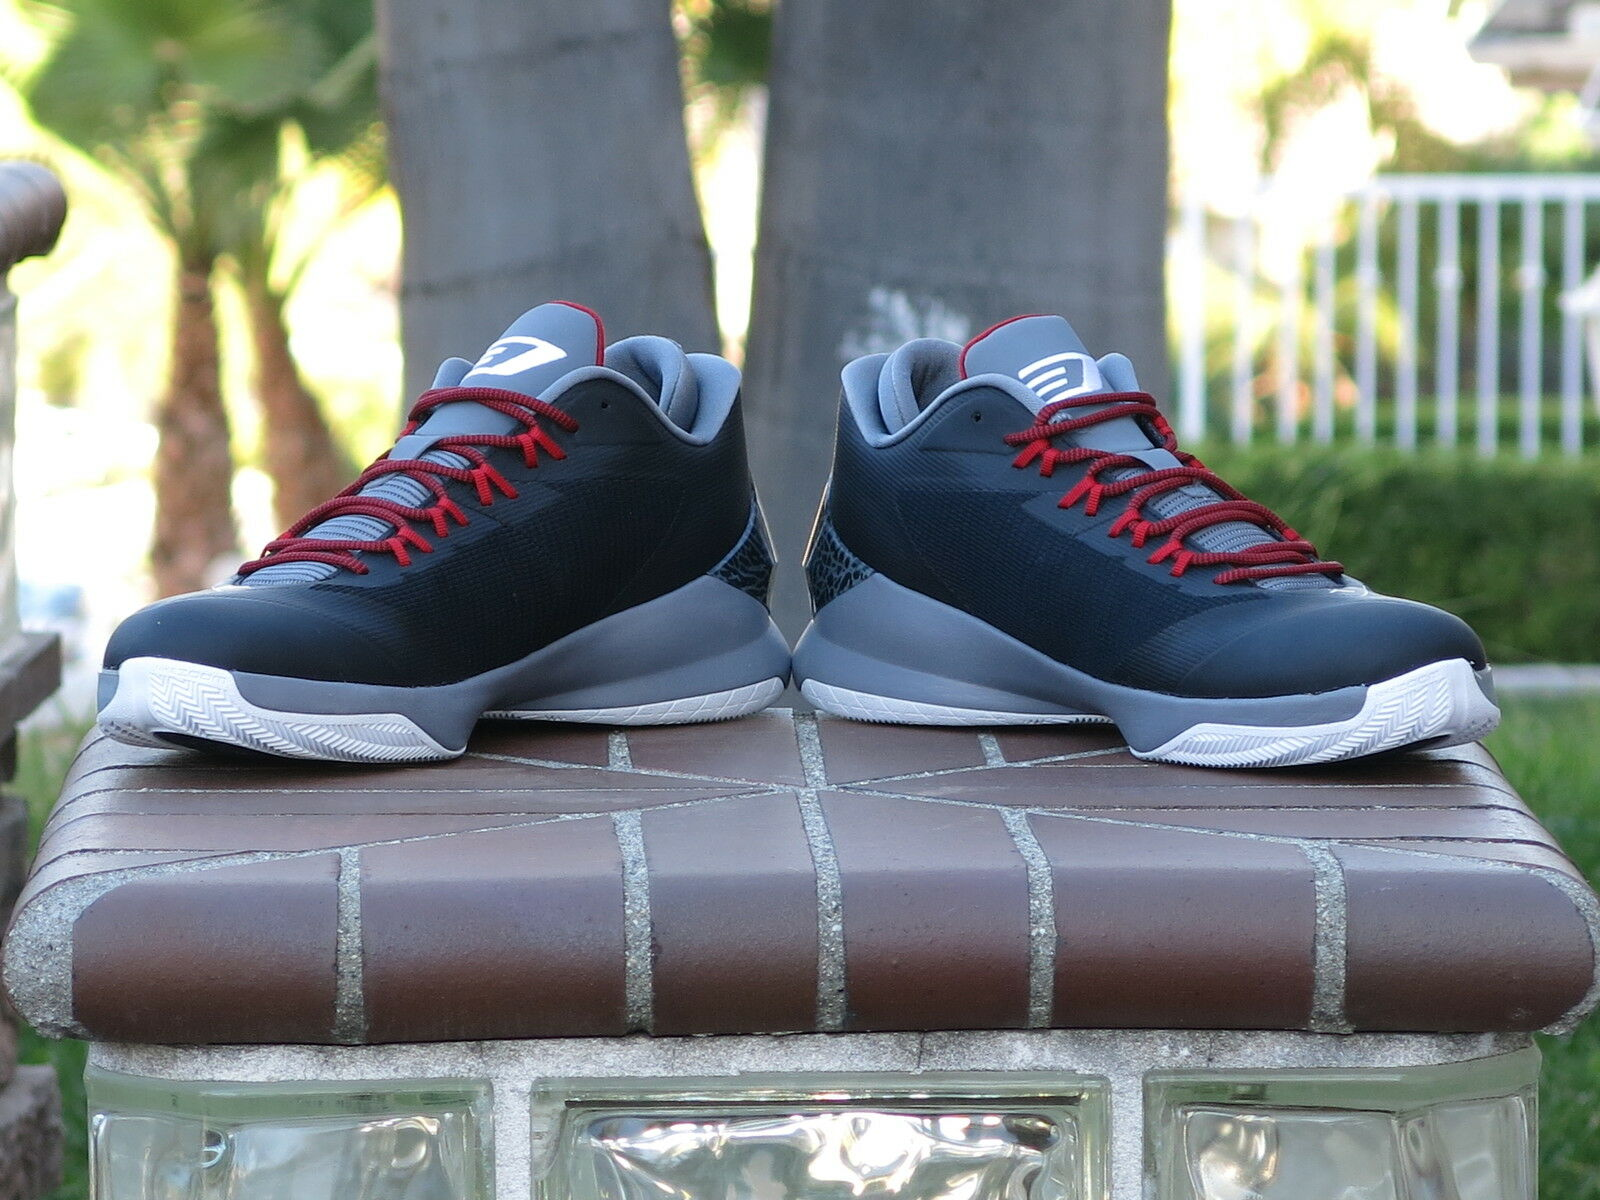 Nike Nike Nike air jordan cp3 chris paul ds männer - basketball - schuhe 684855-001 sz 12 cba2fe